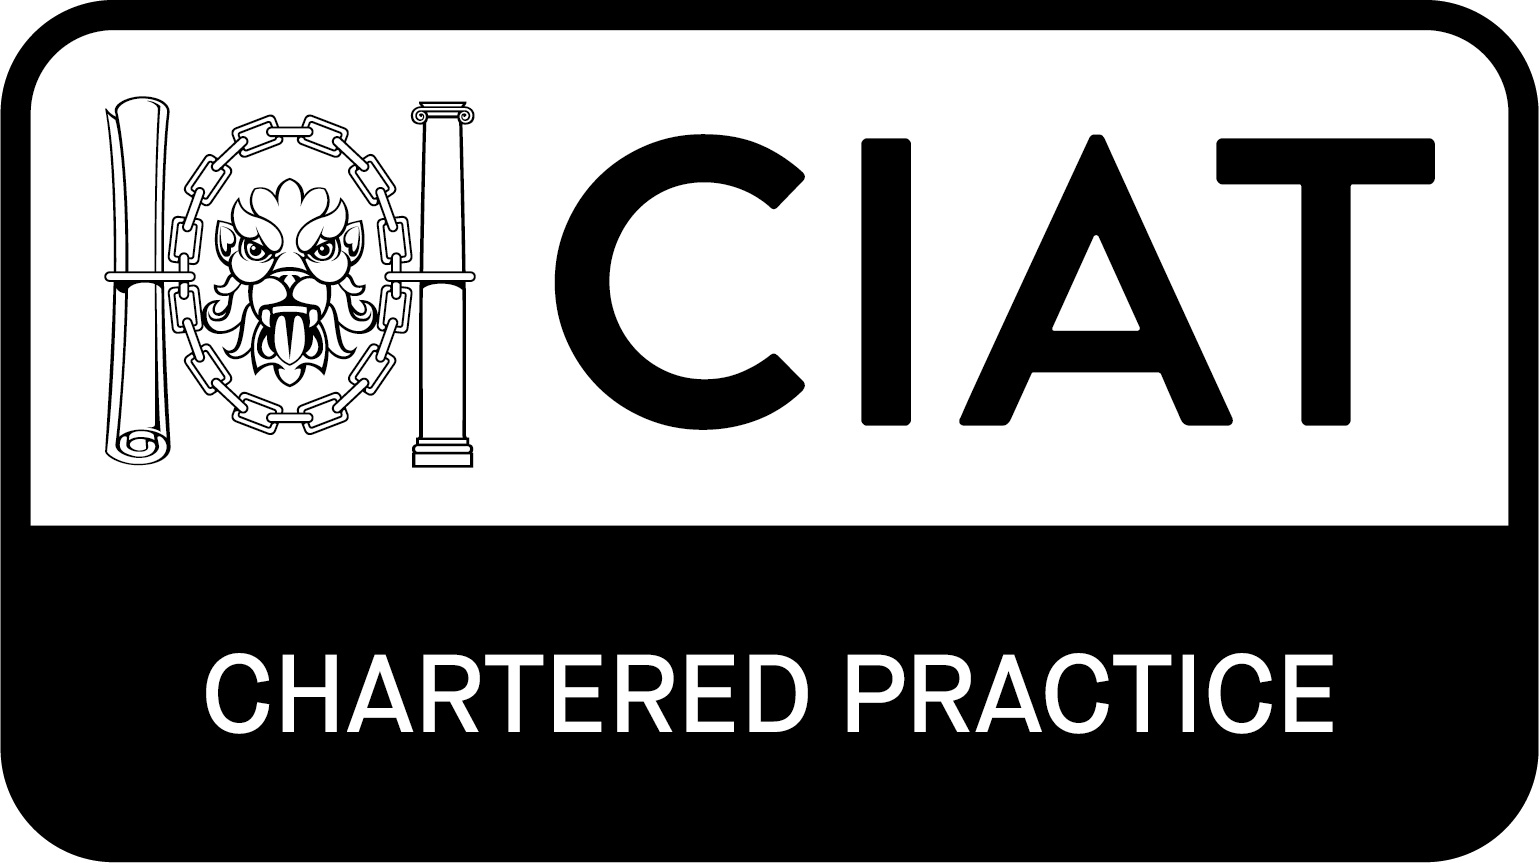 https://0201.nccdn.net/1_2/000/000/15c/093/ciat-chartered-practice.jpg